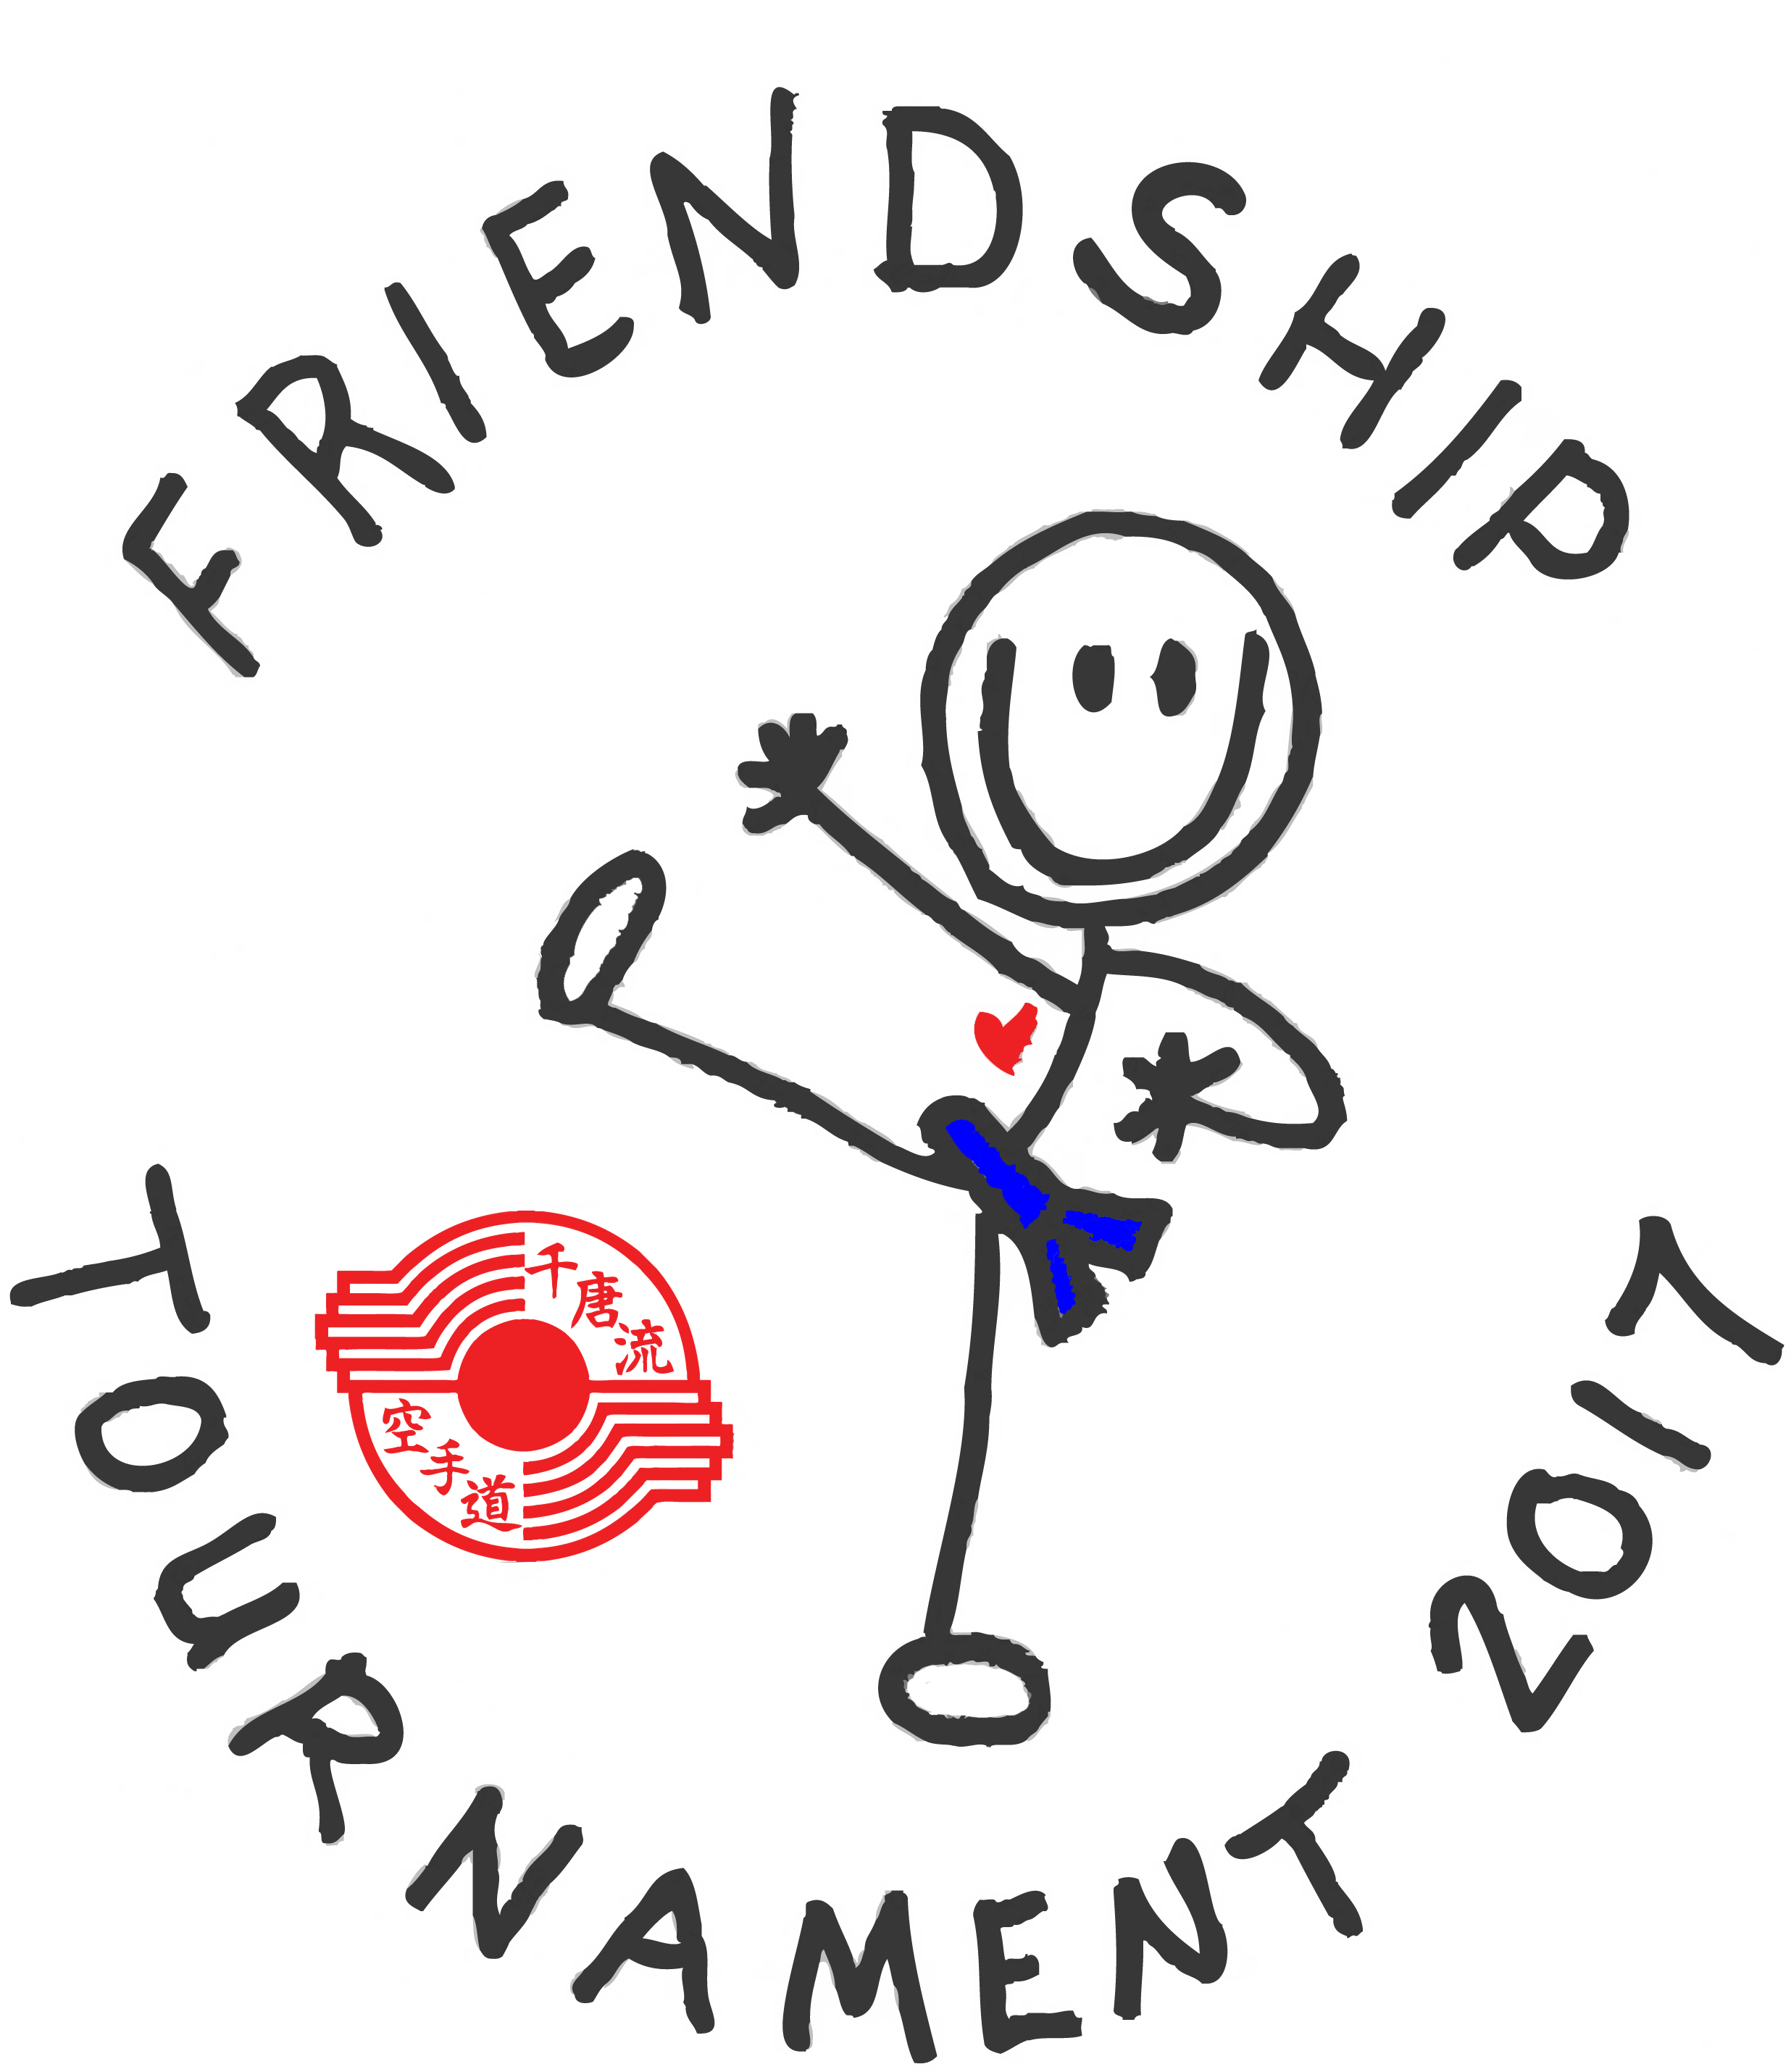 Shirt design contest 2017 - 2017 Friendship Tournament T Shirt Design Contest Winner